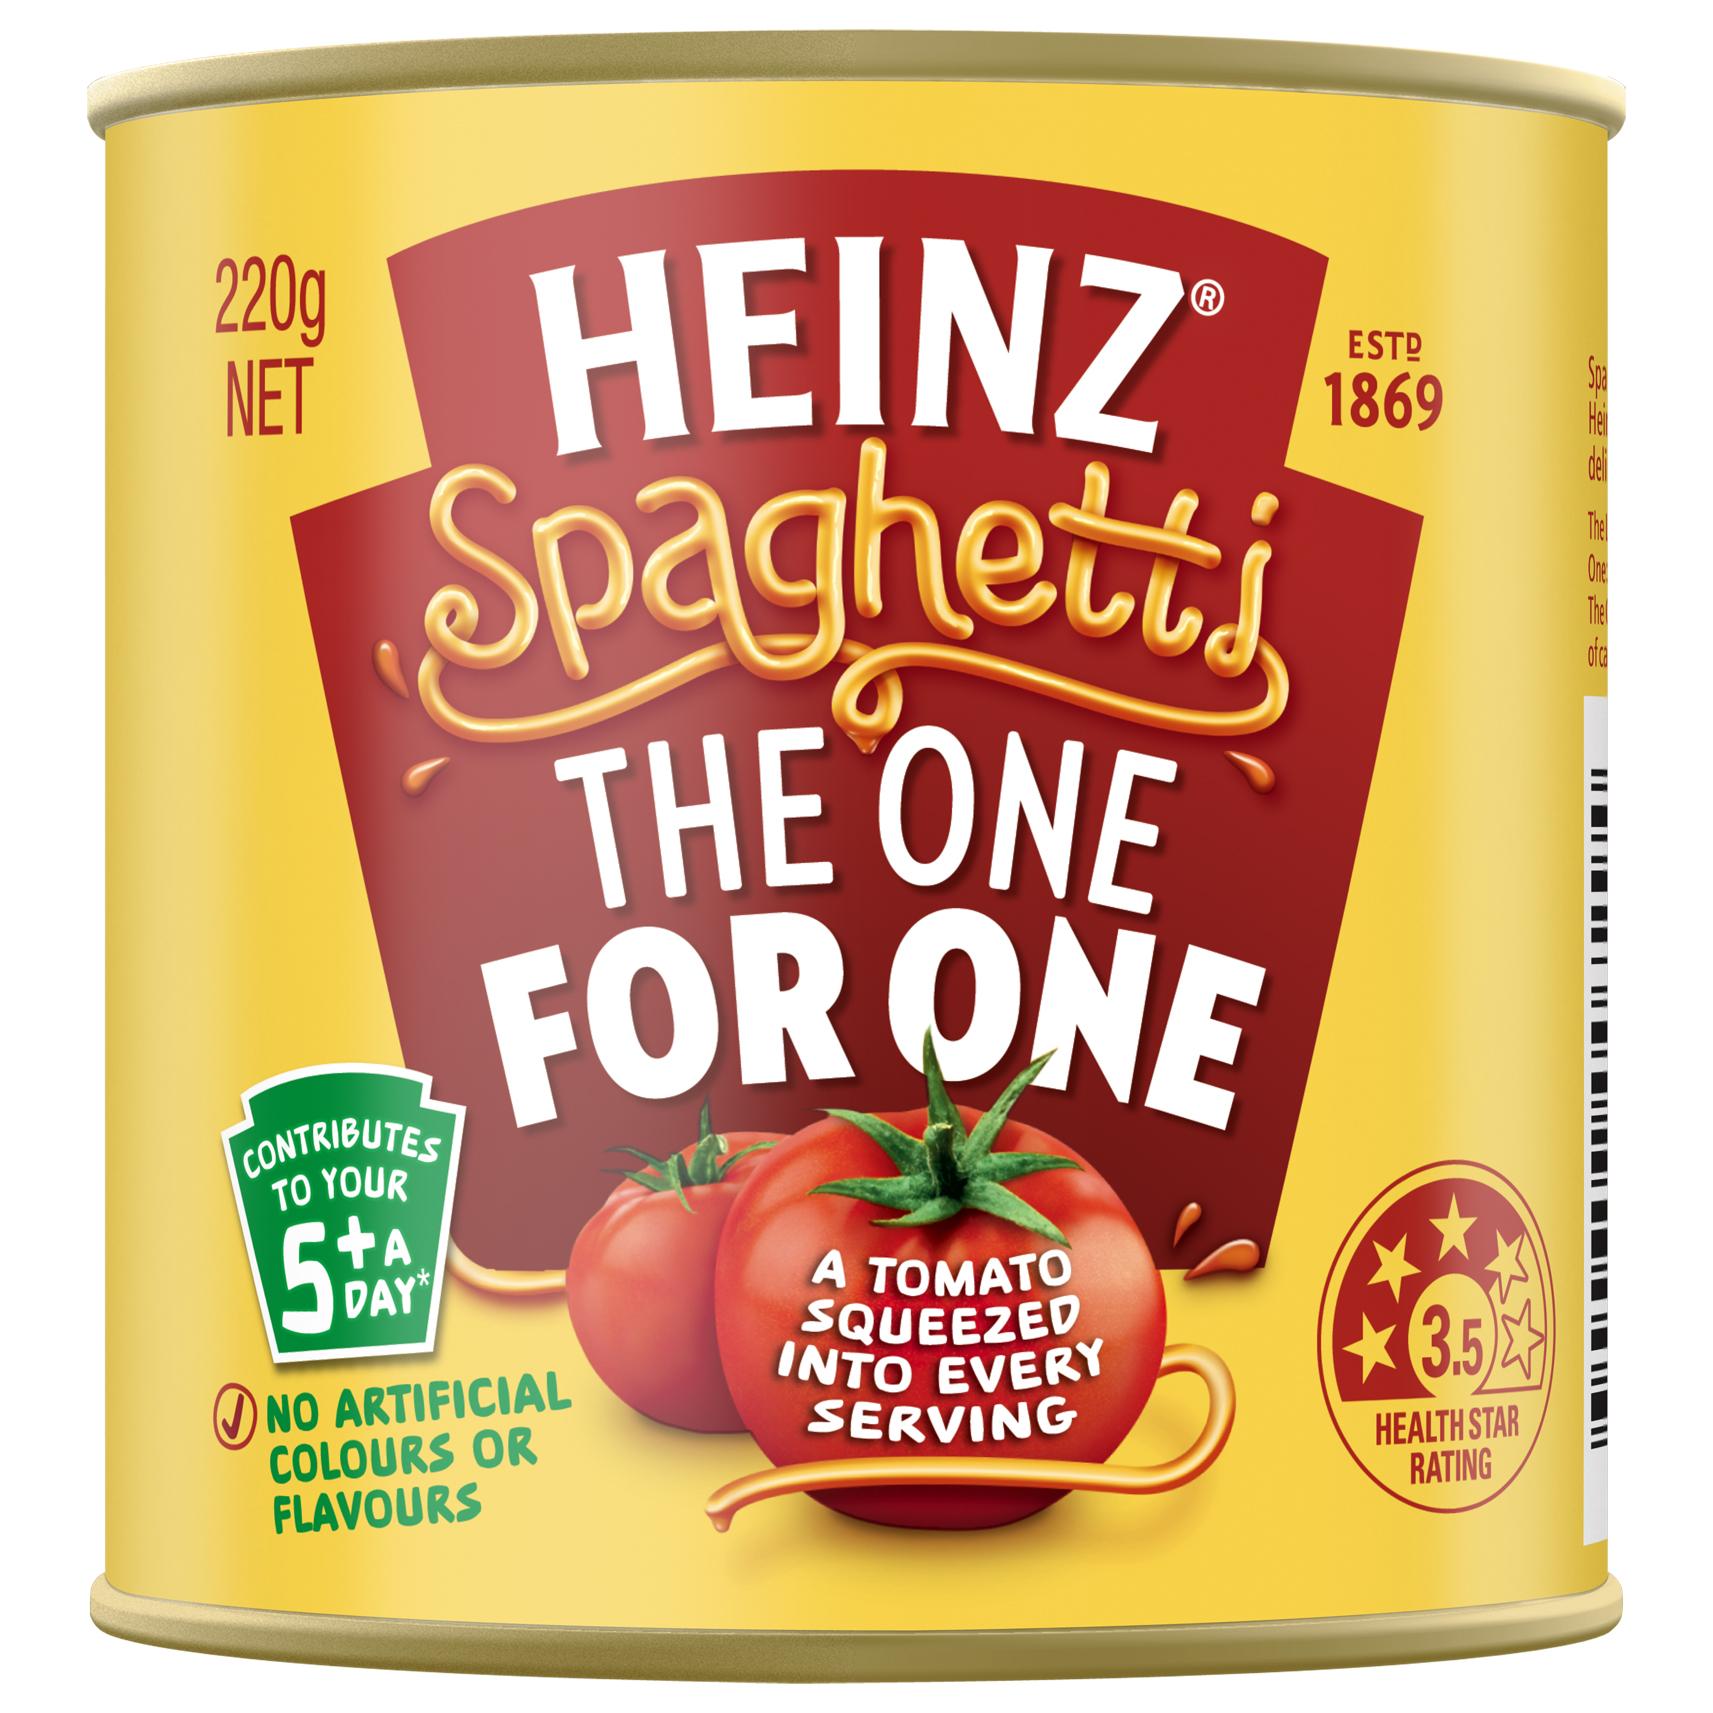 Heinz Spaghetti in Tomato Sauce 220g